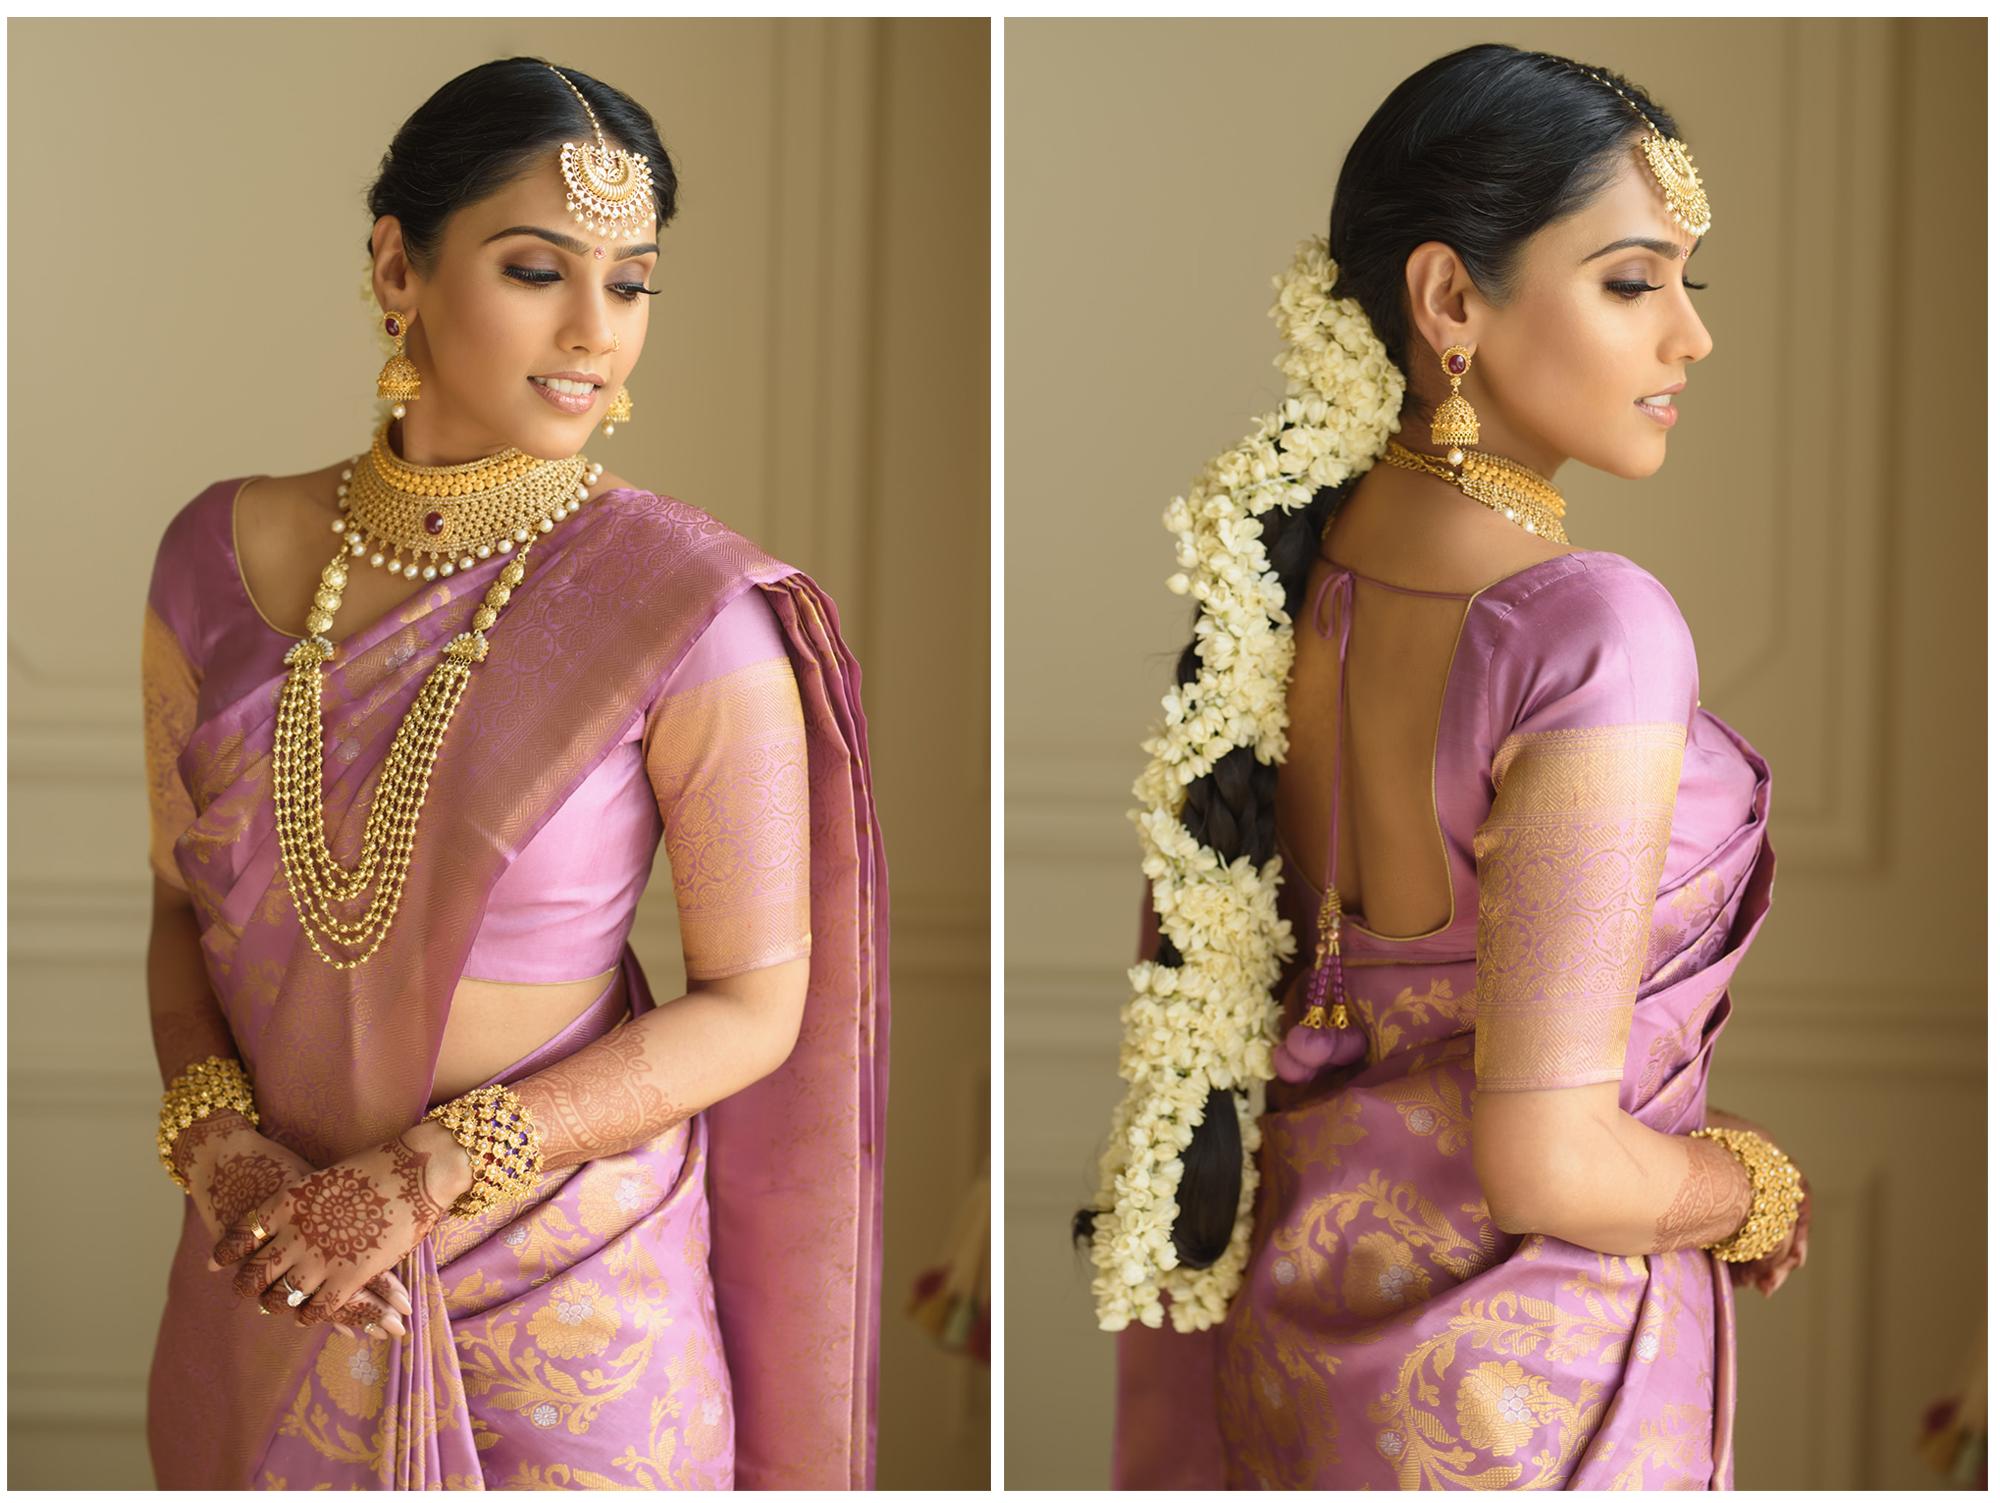 Tamil-Gujrati-hindu-wedding-photography-photographer-london-the-savoy--244.jpg